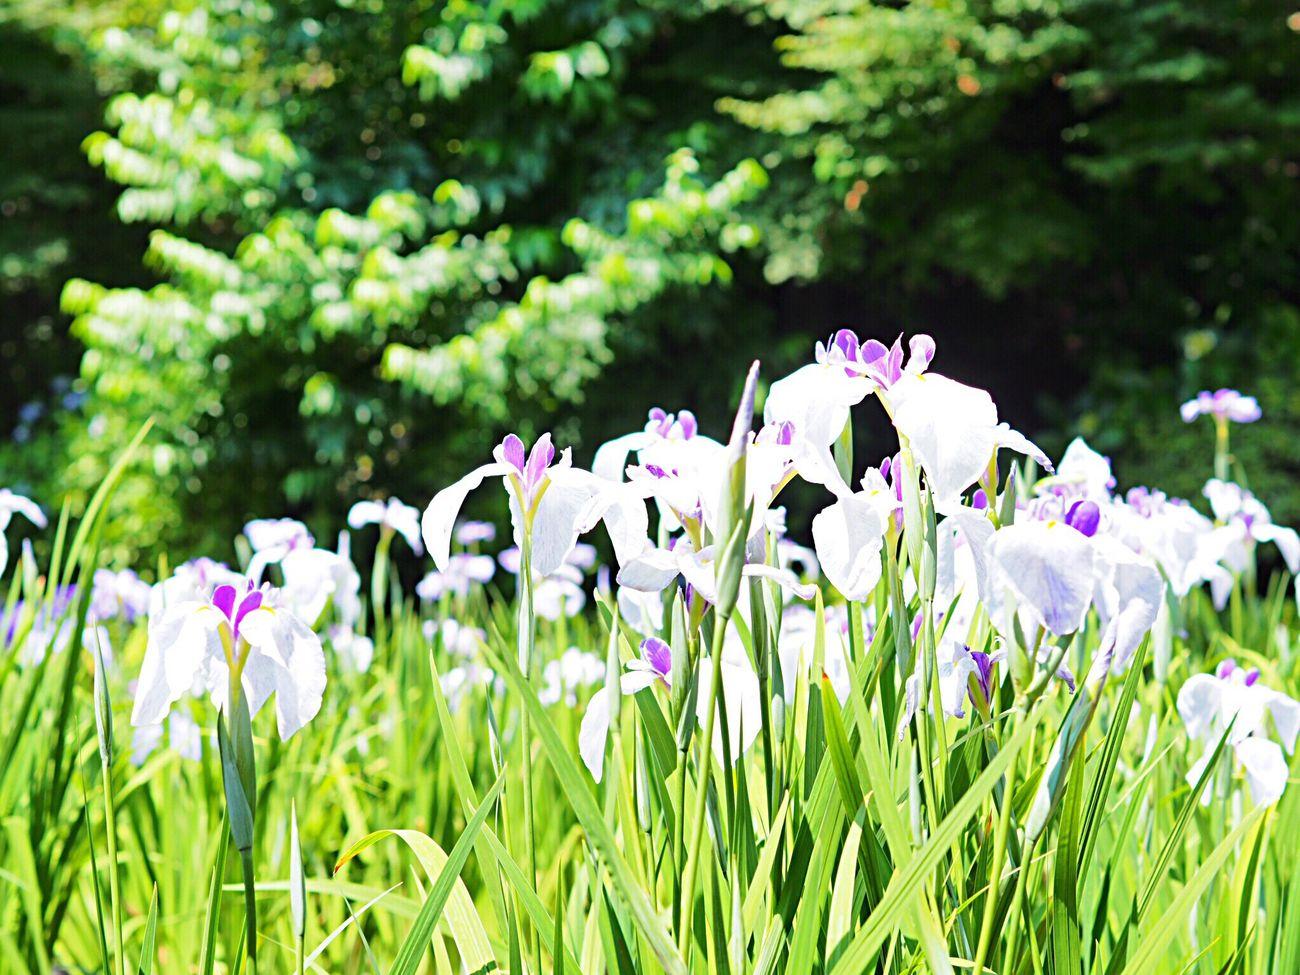 Flower Growth Nature Beauty In Nature Fragility Purple Freshness Plant Focus On Foreground Green Color Flower Head Blooming White Flower Iris Flower Iris 花菖蒲 Scenics Landscape Odawara Kanagawa,japan Olympus Om-d E-m10